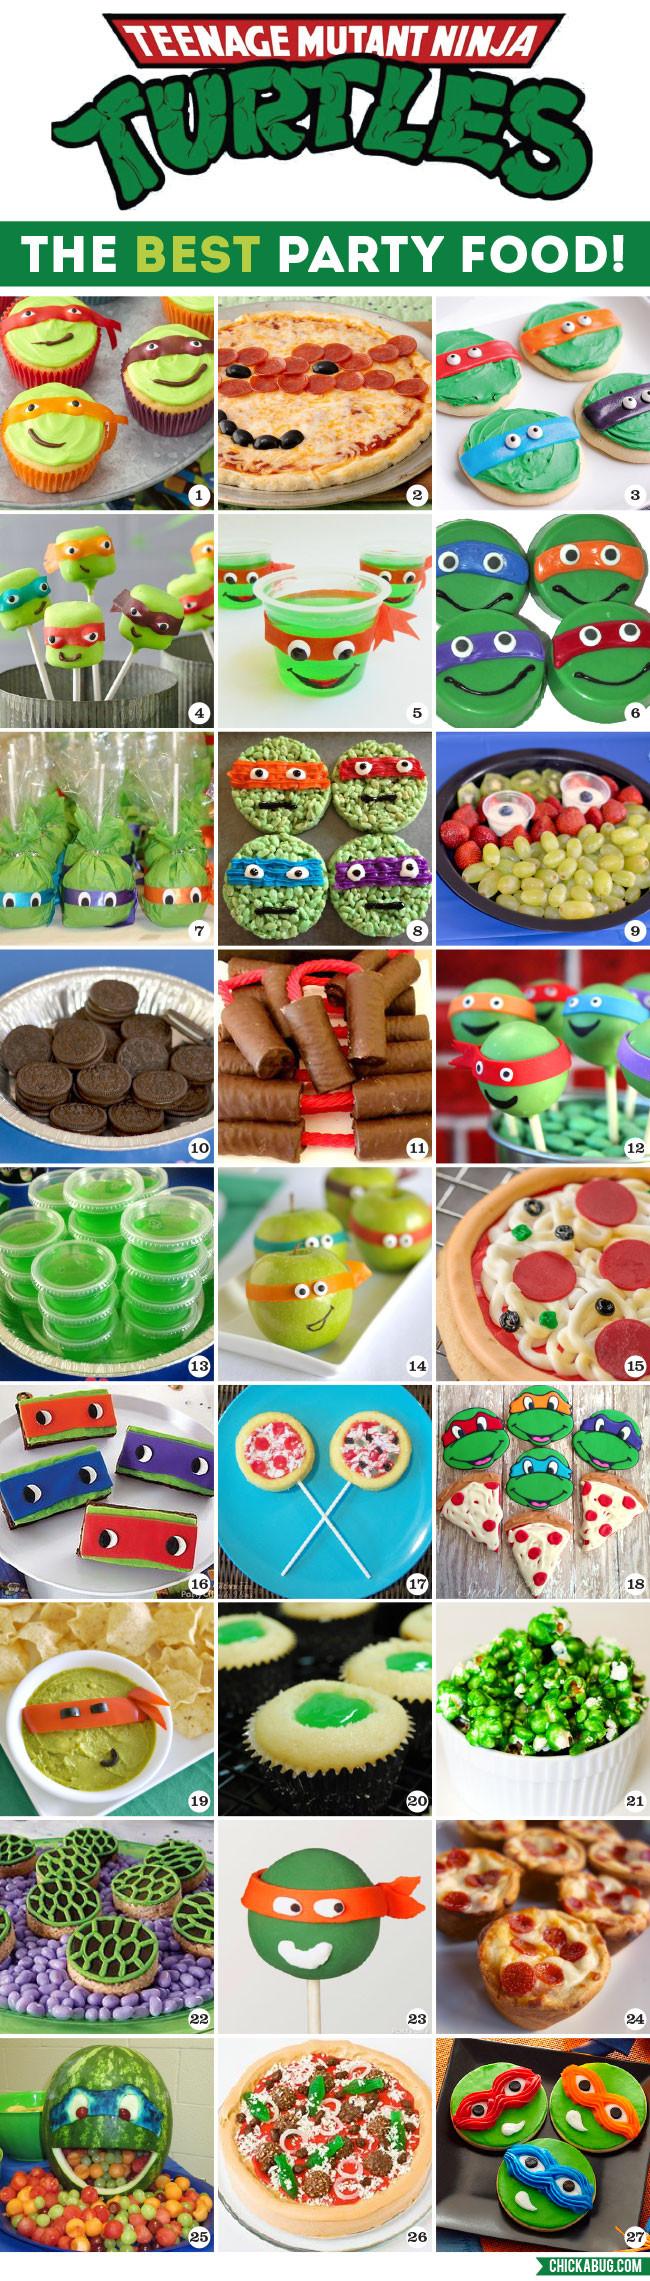 Ninja Turtles Birthday Party Food Ideas  The Best TMNT Party Food